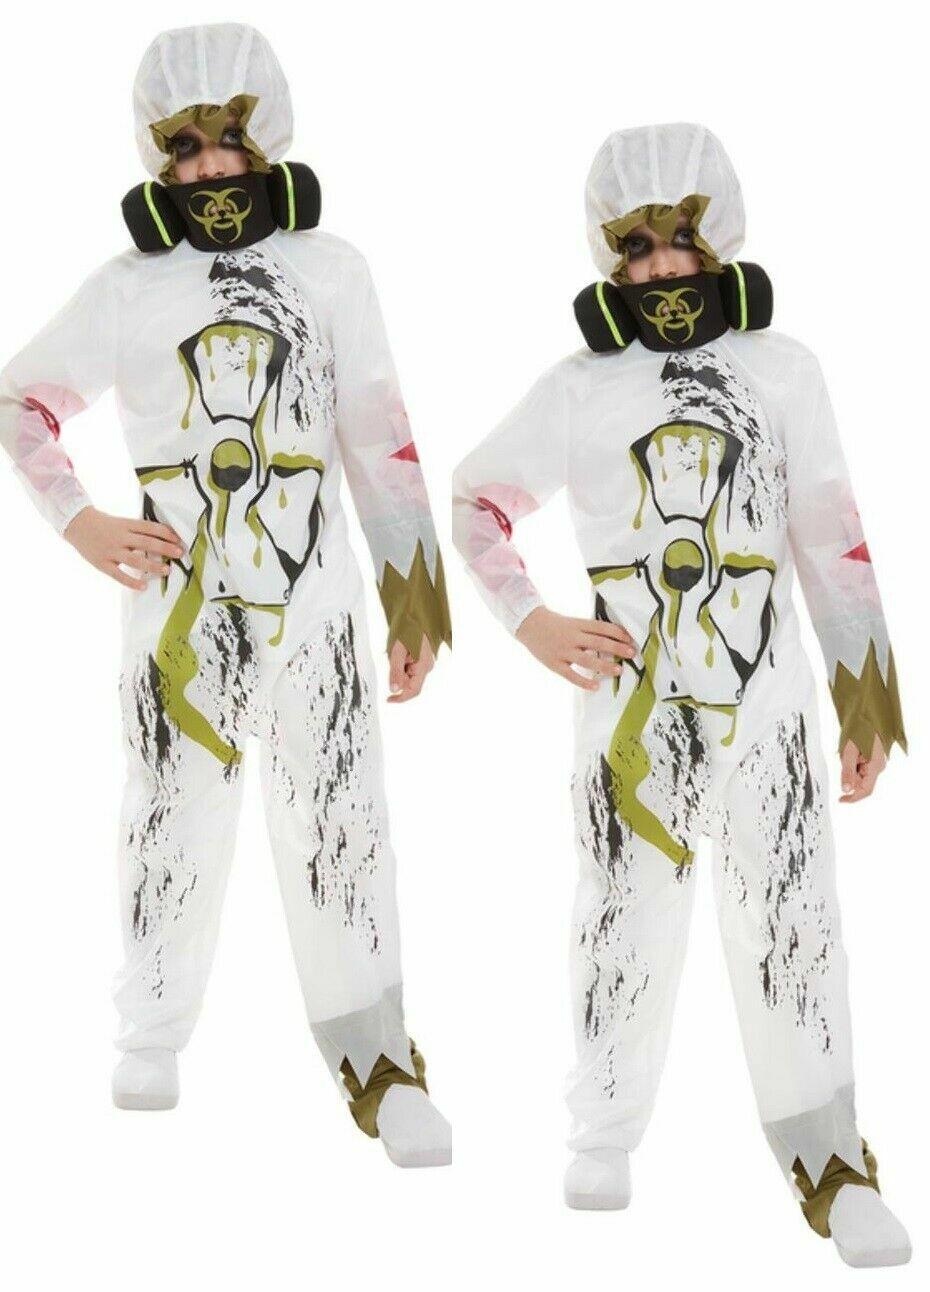 Kids Biohazard Suit Costume - Fancy Dress Halloween Scary Party Horror